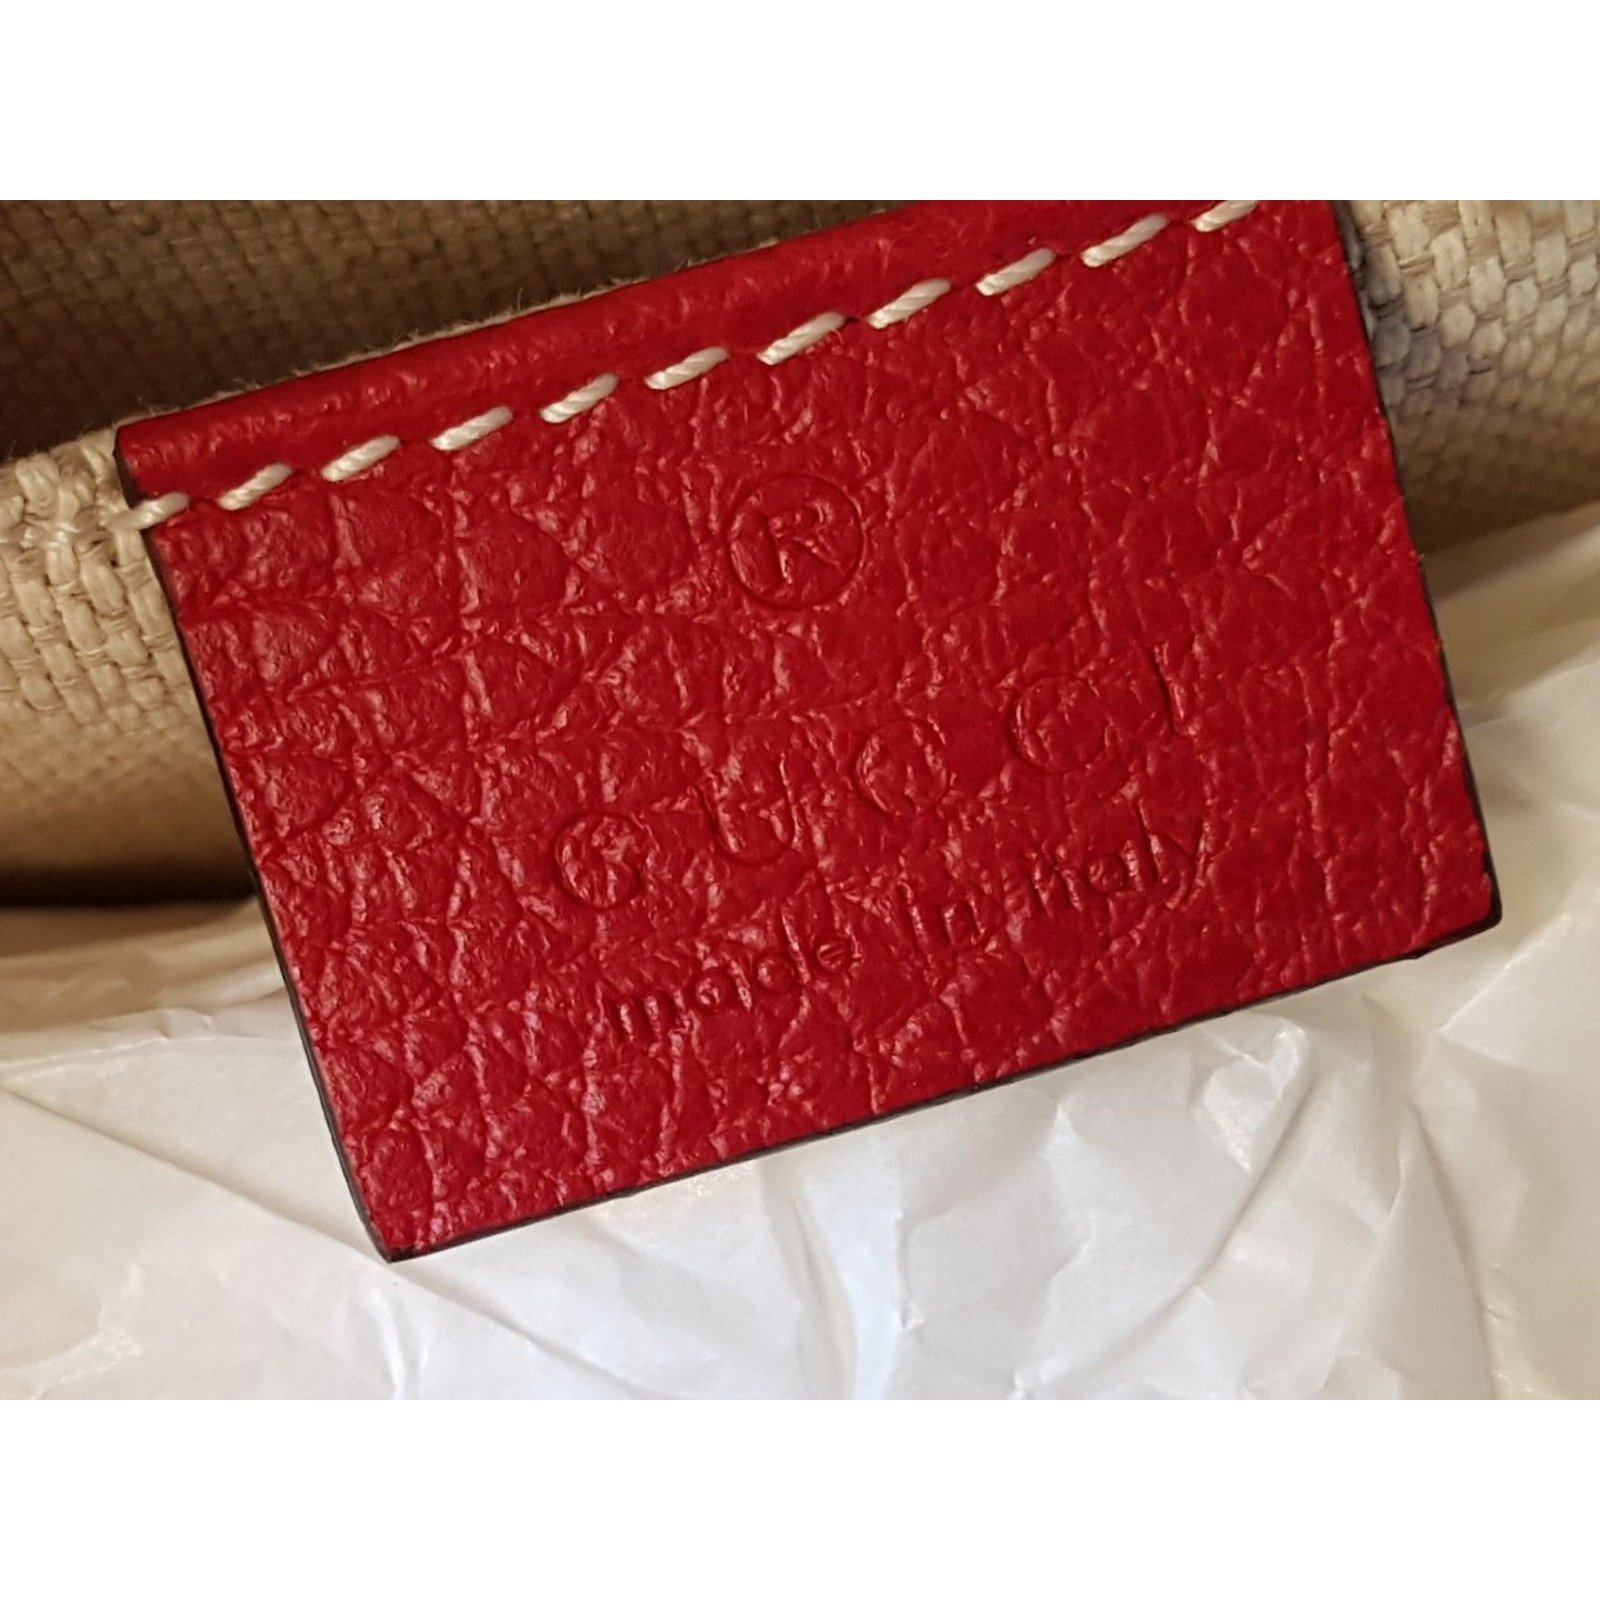 d184c4ca4f19e Gucci gucci disco bag soho double color red  fucsia new no used with receipt  Handbags Leather Multiple colors ref.43085 - Joli Closet